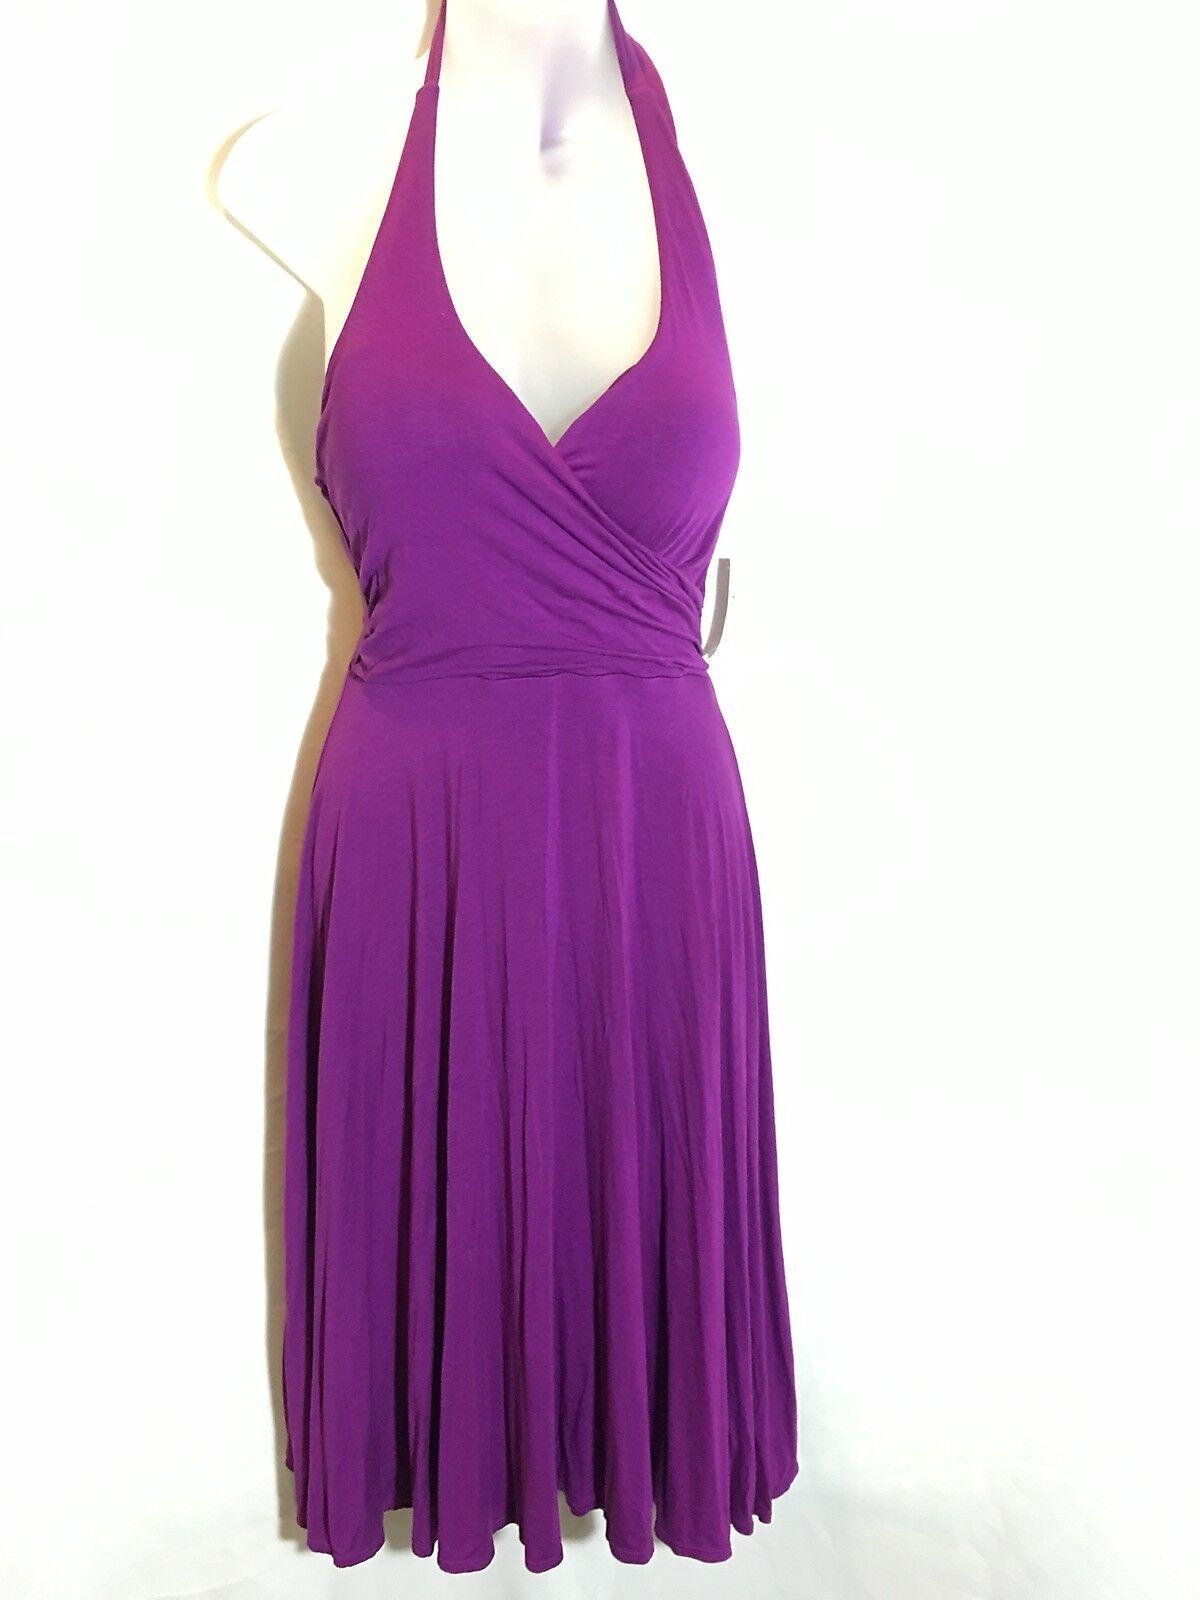 NEW Victorias Secret Moda Miraculous Push-Up Halter Bra Top Dress Purple 34A